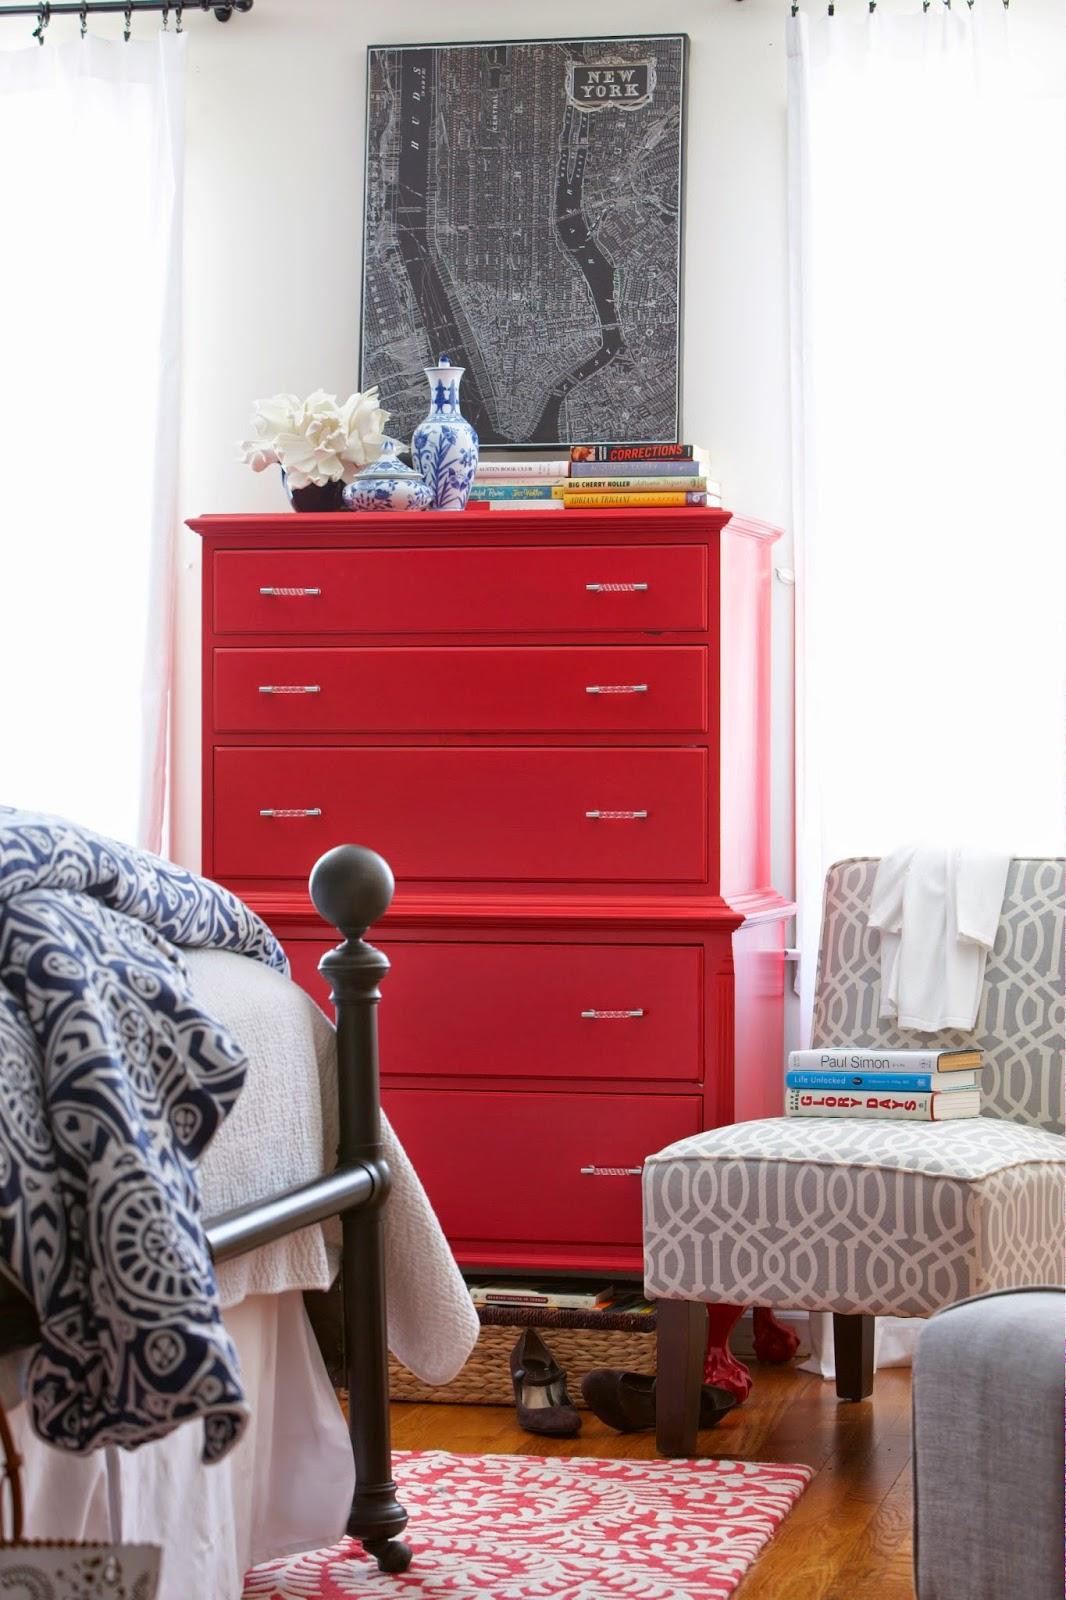 Paul Simon Bedroom Furniture Karin Lidbeck A Bedroom Makeover Between Friends